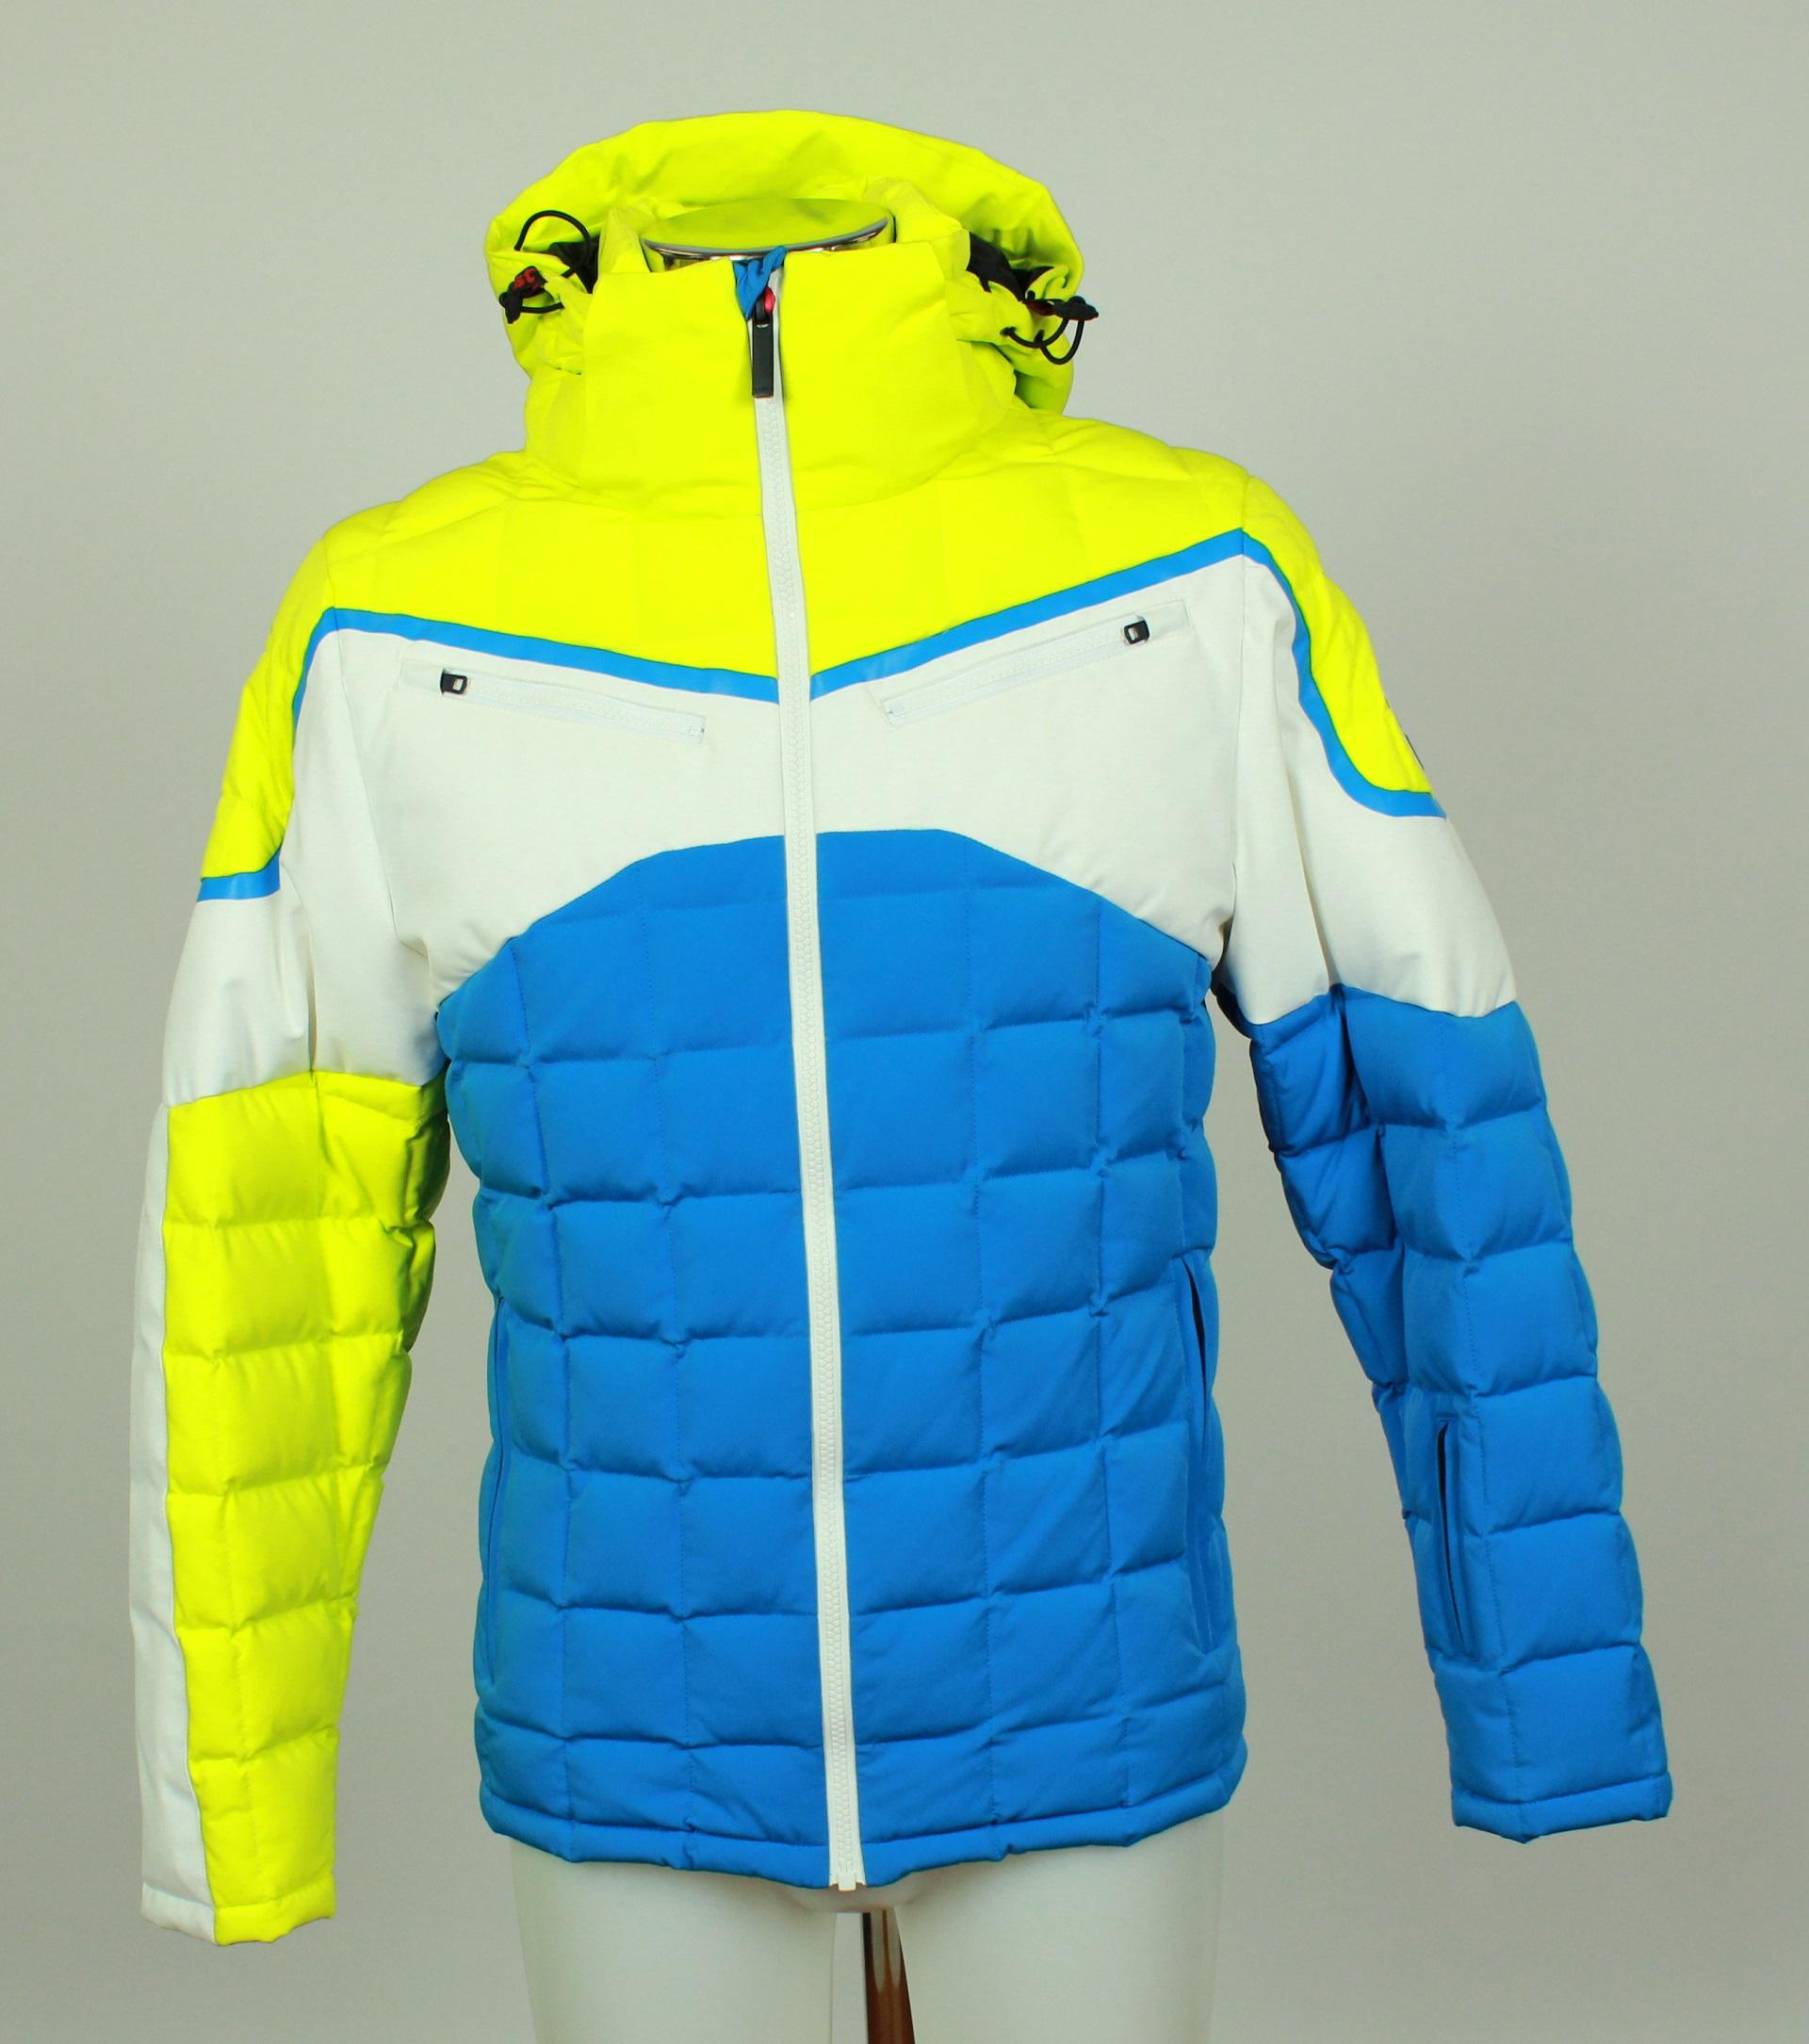 da8e5110251 Vist Corrado Ski Jacket empty